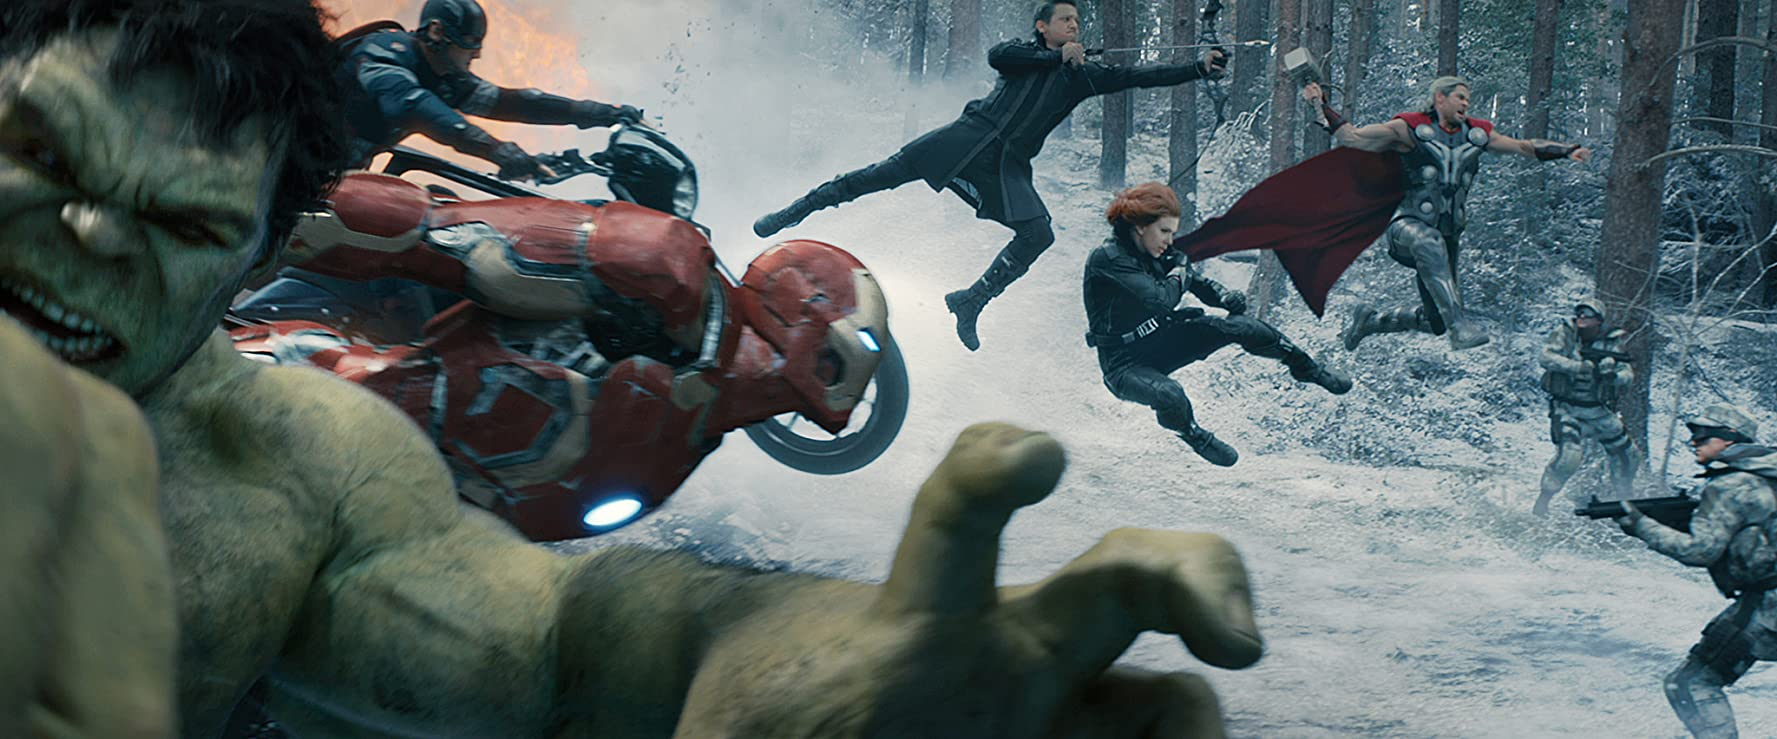 Avengers – Age of Ultron (2015) (In Hindi)